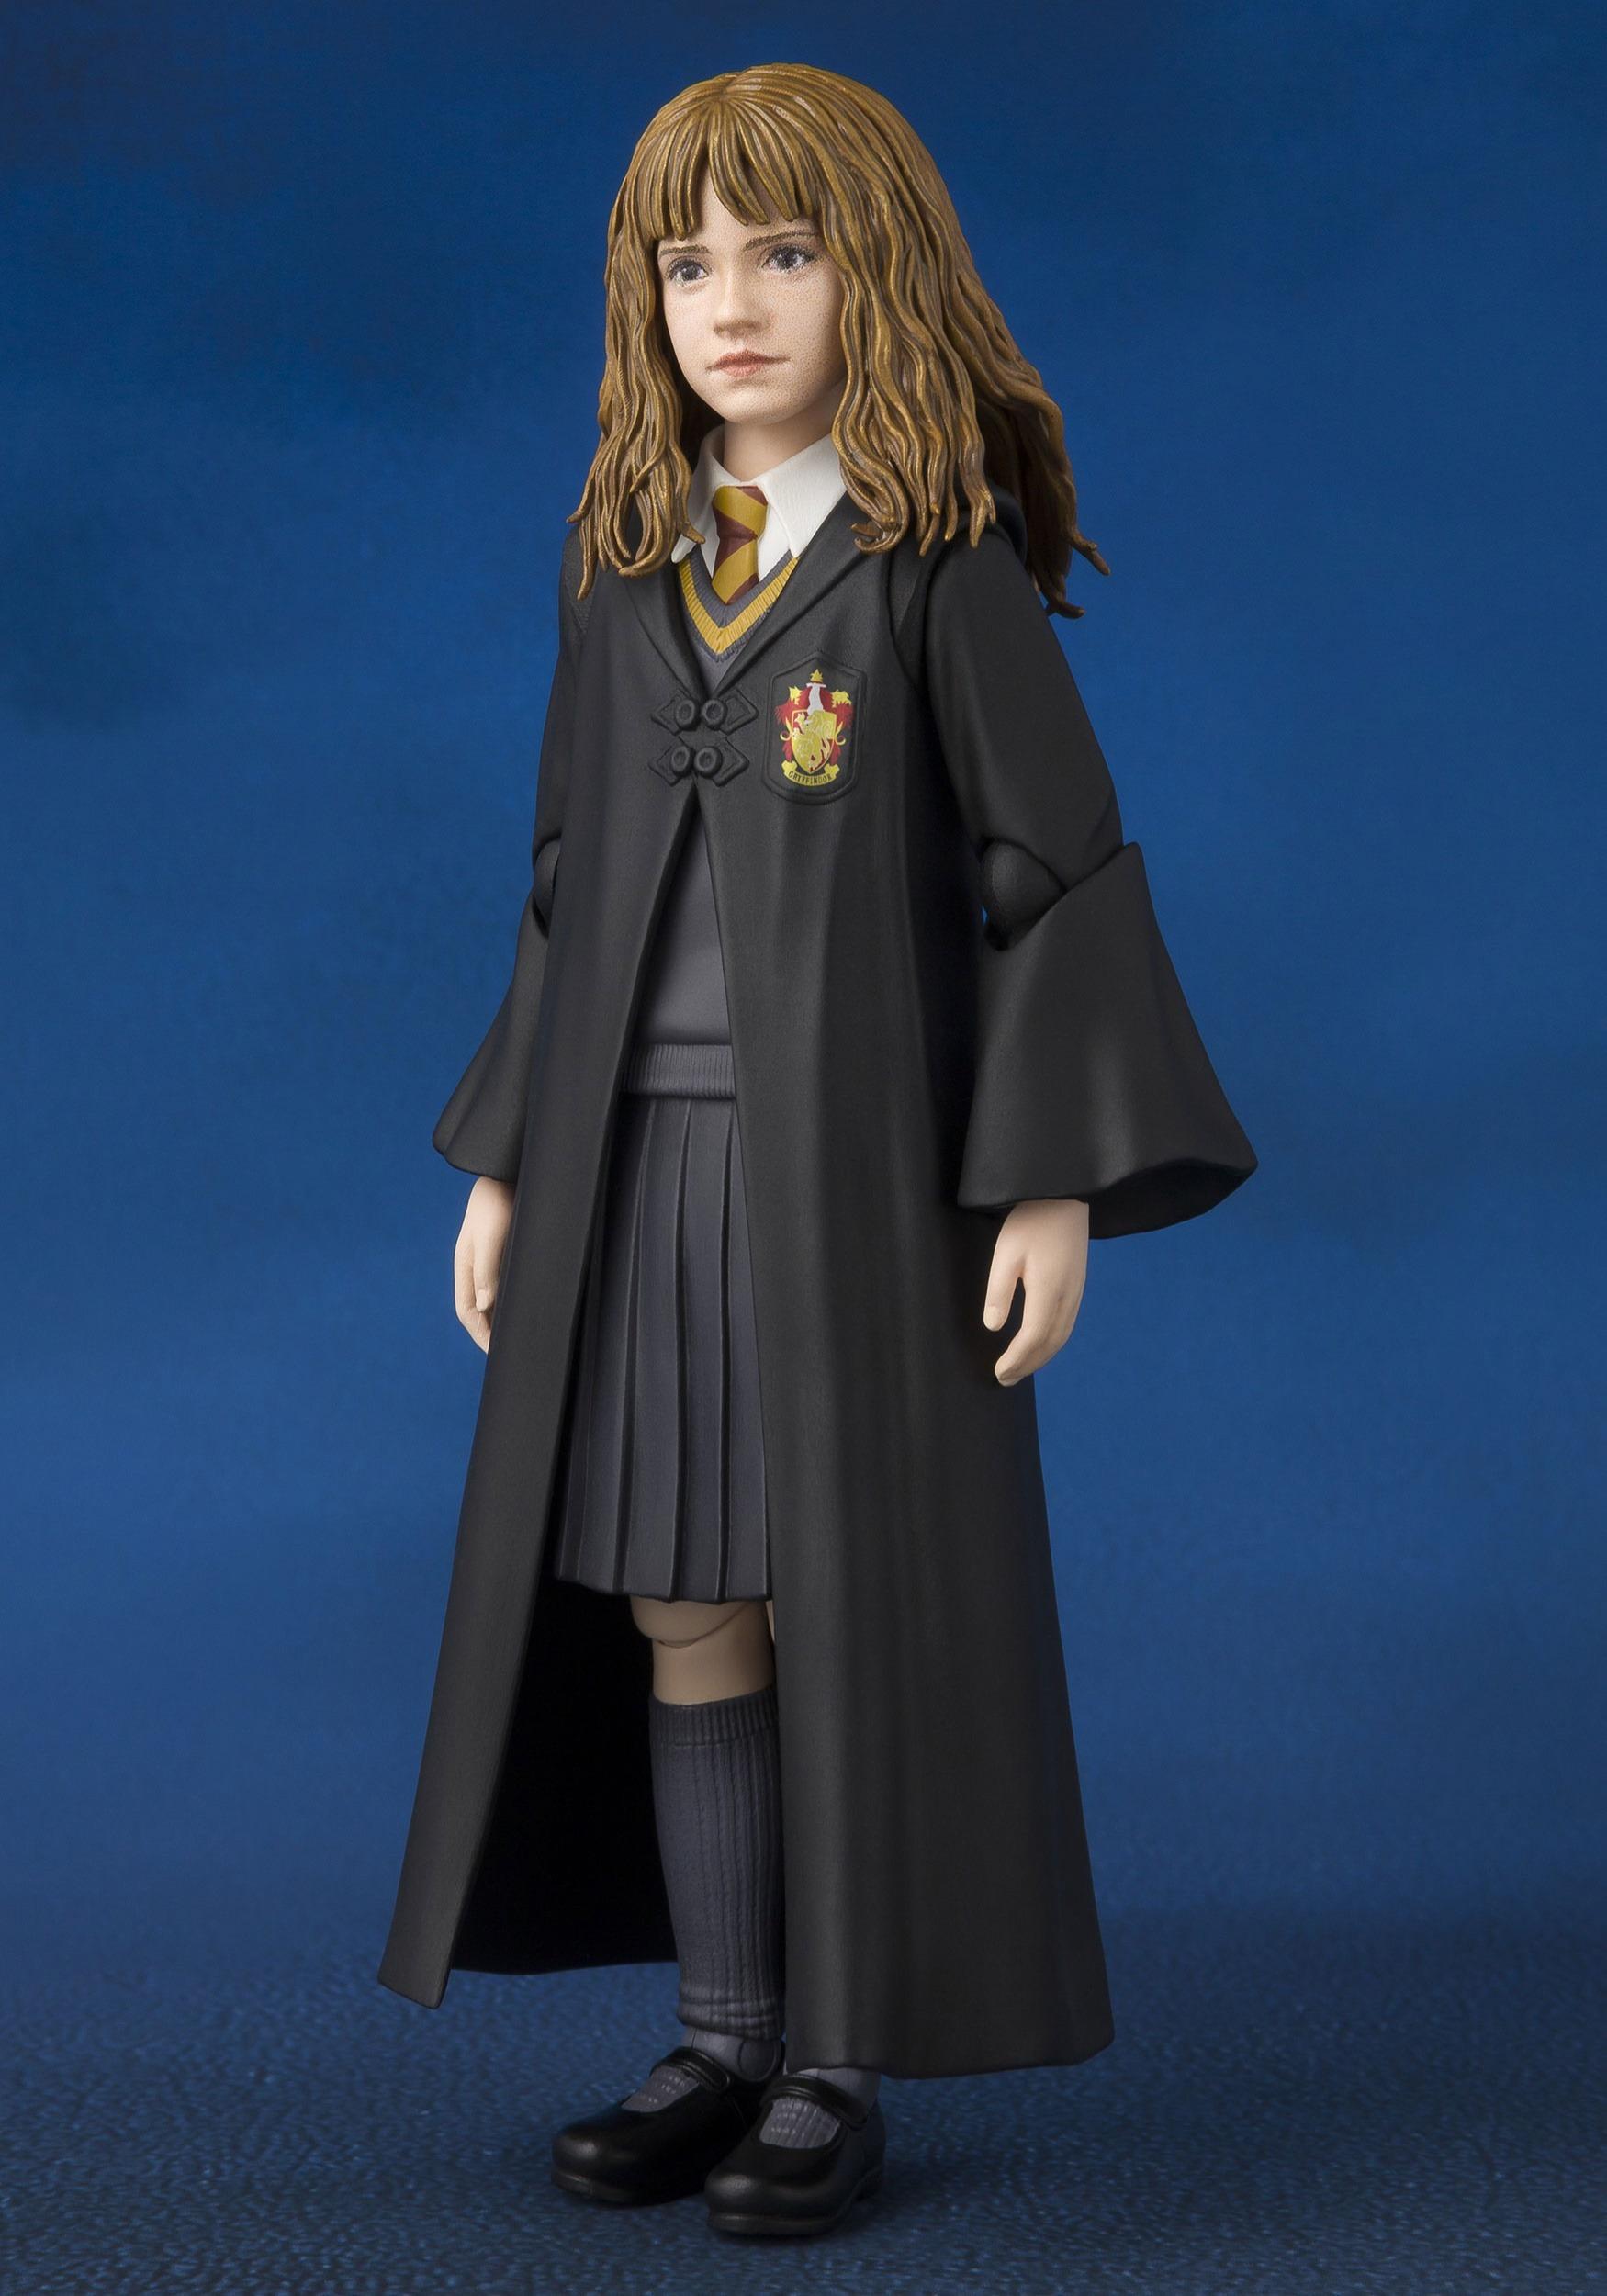 Collectible Hermione Granger Bandai Tamashii Nations S.H. Figure